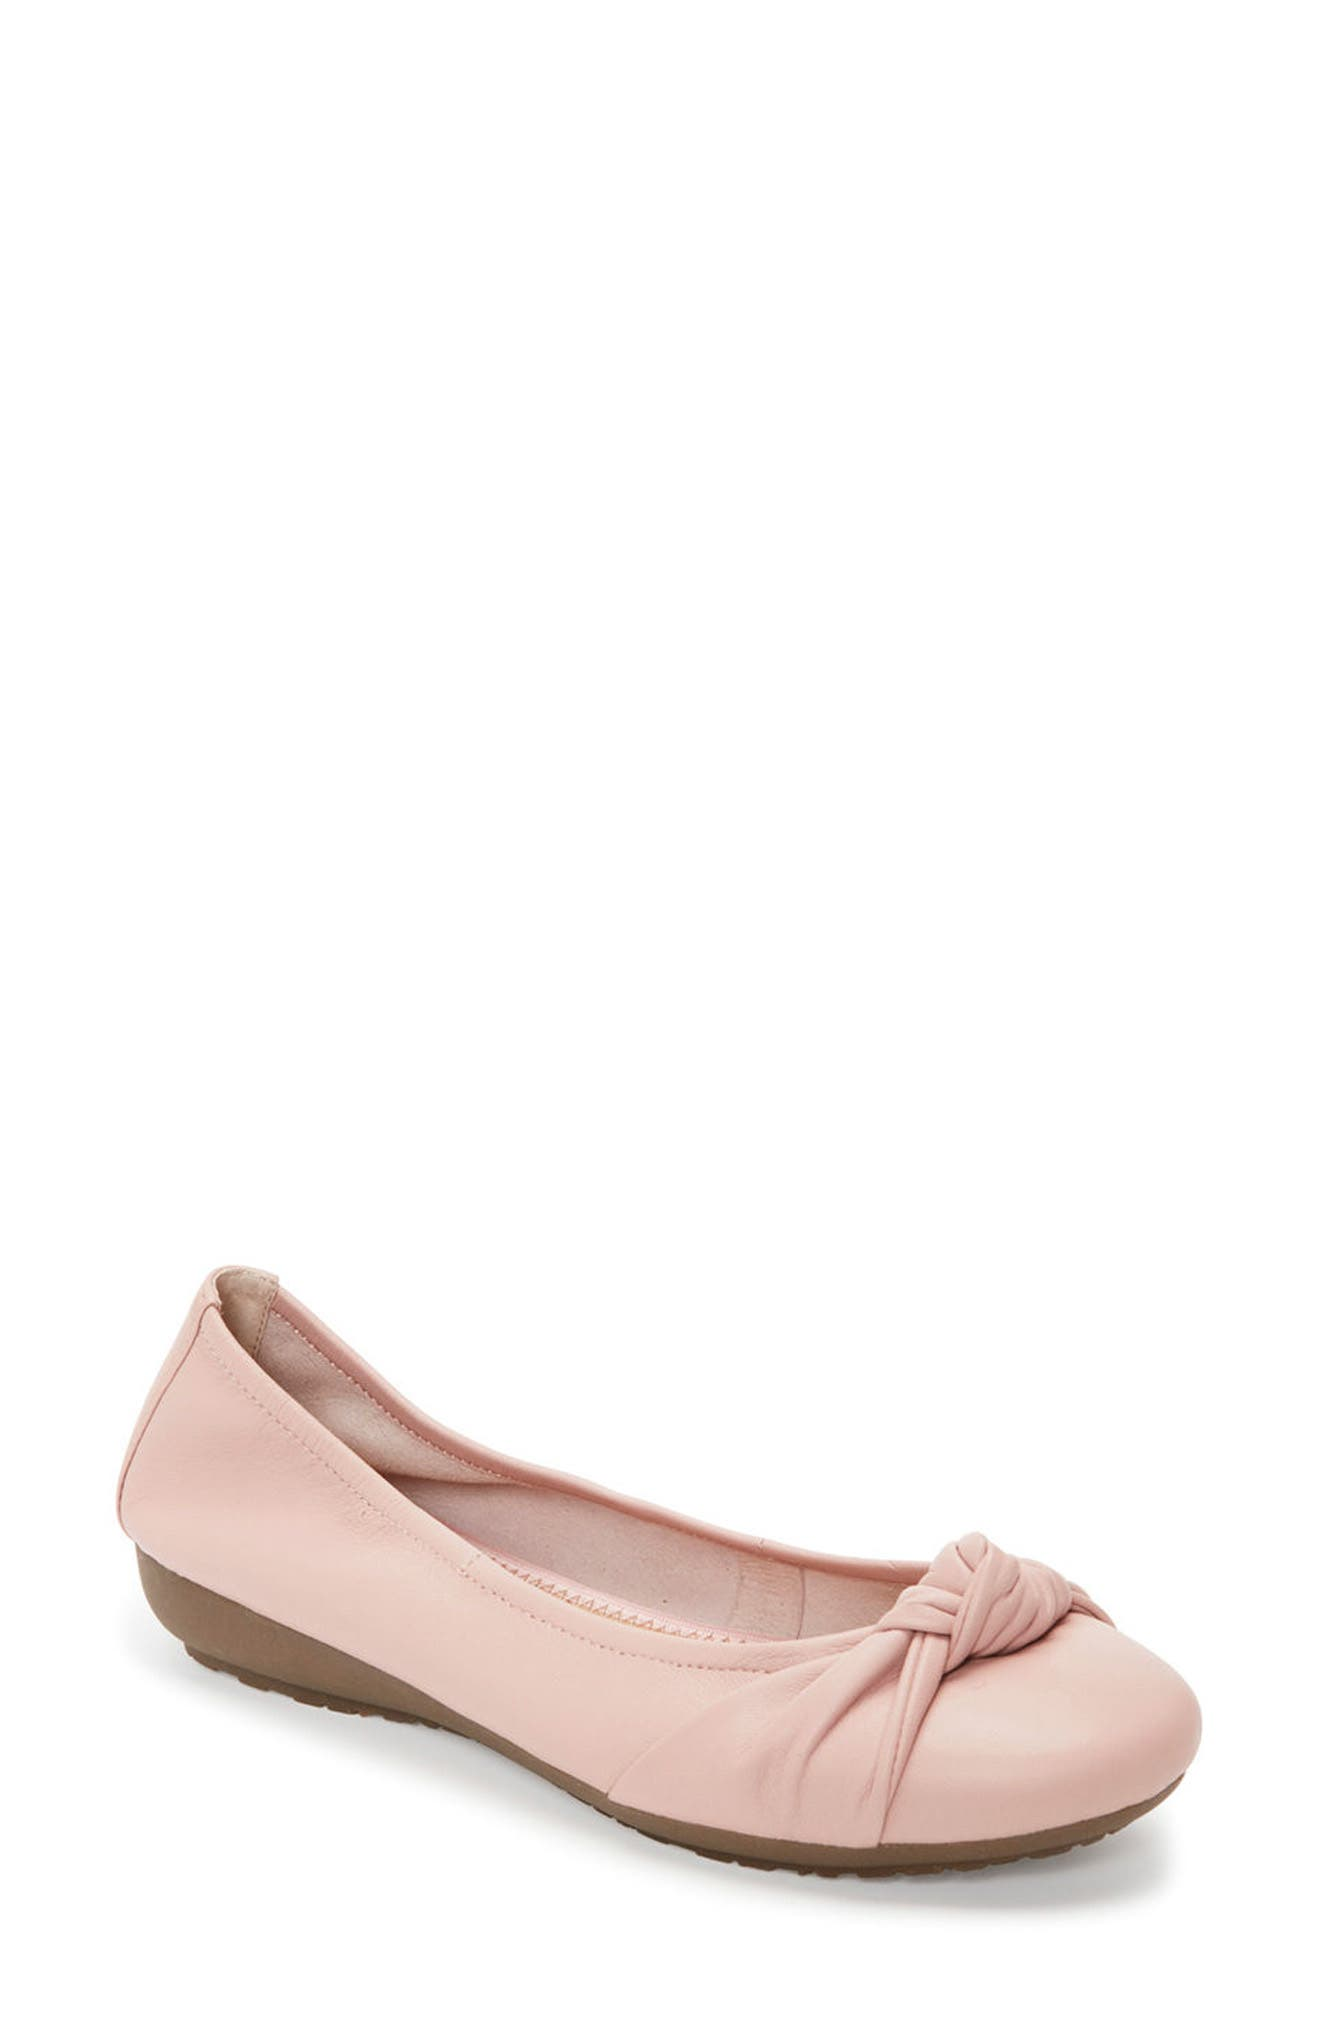 Jaci Flat,                         Main,                         color, Pink Leather